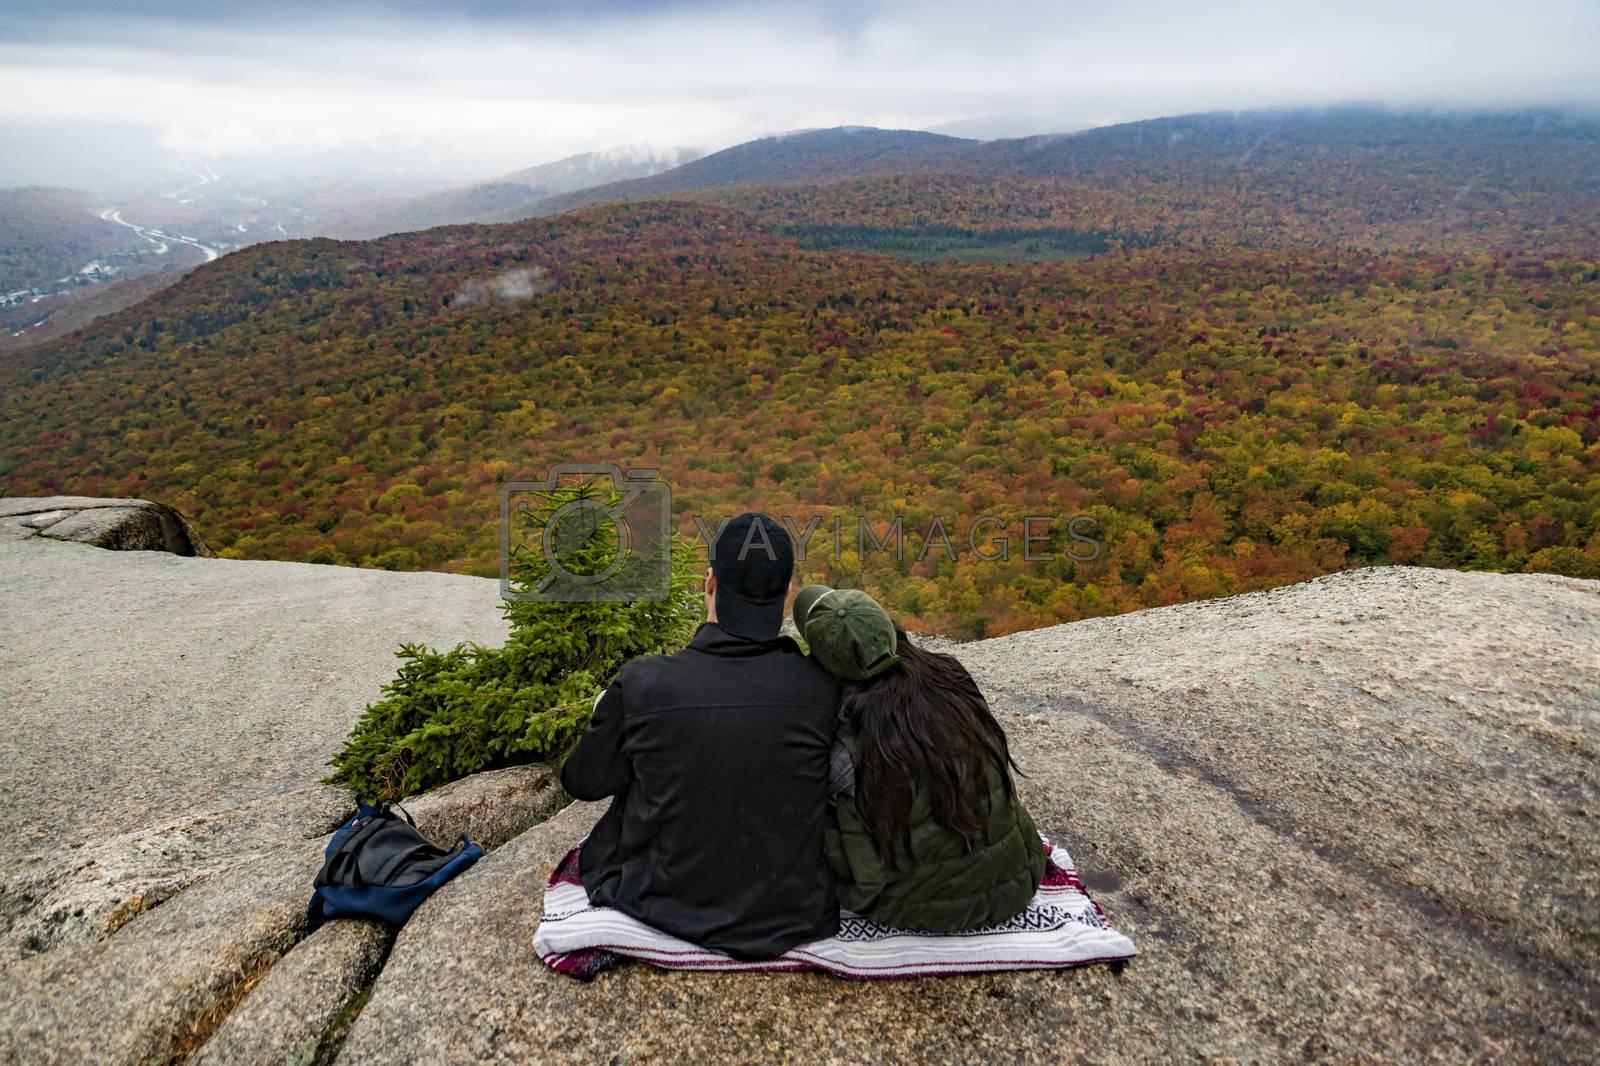 Two hikers watching fall foliage around Mount Washington in New Hampshire, USA